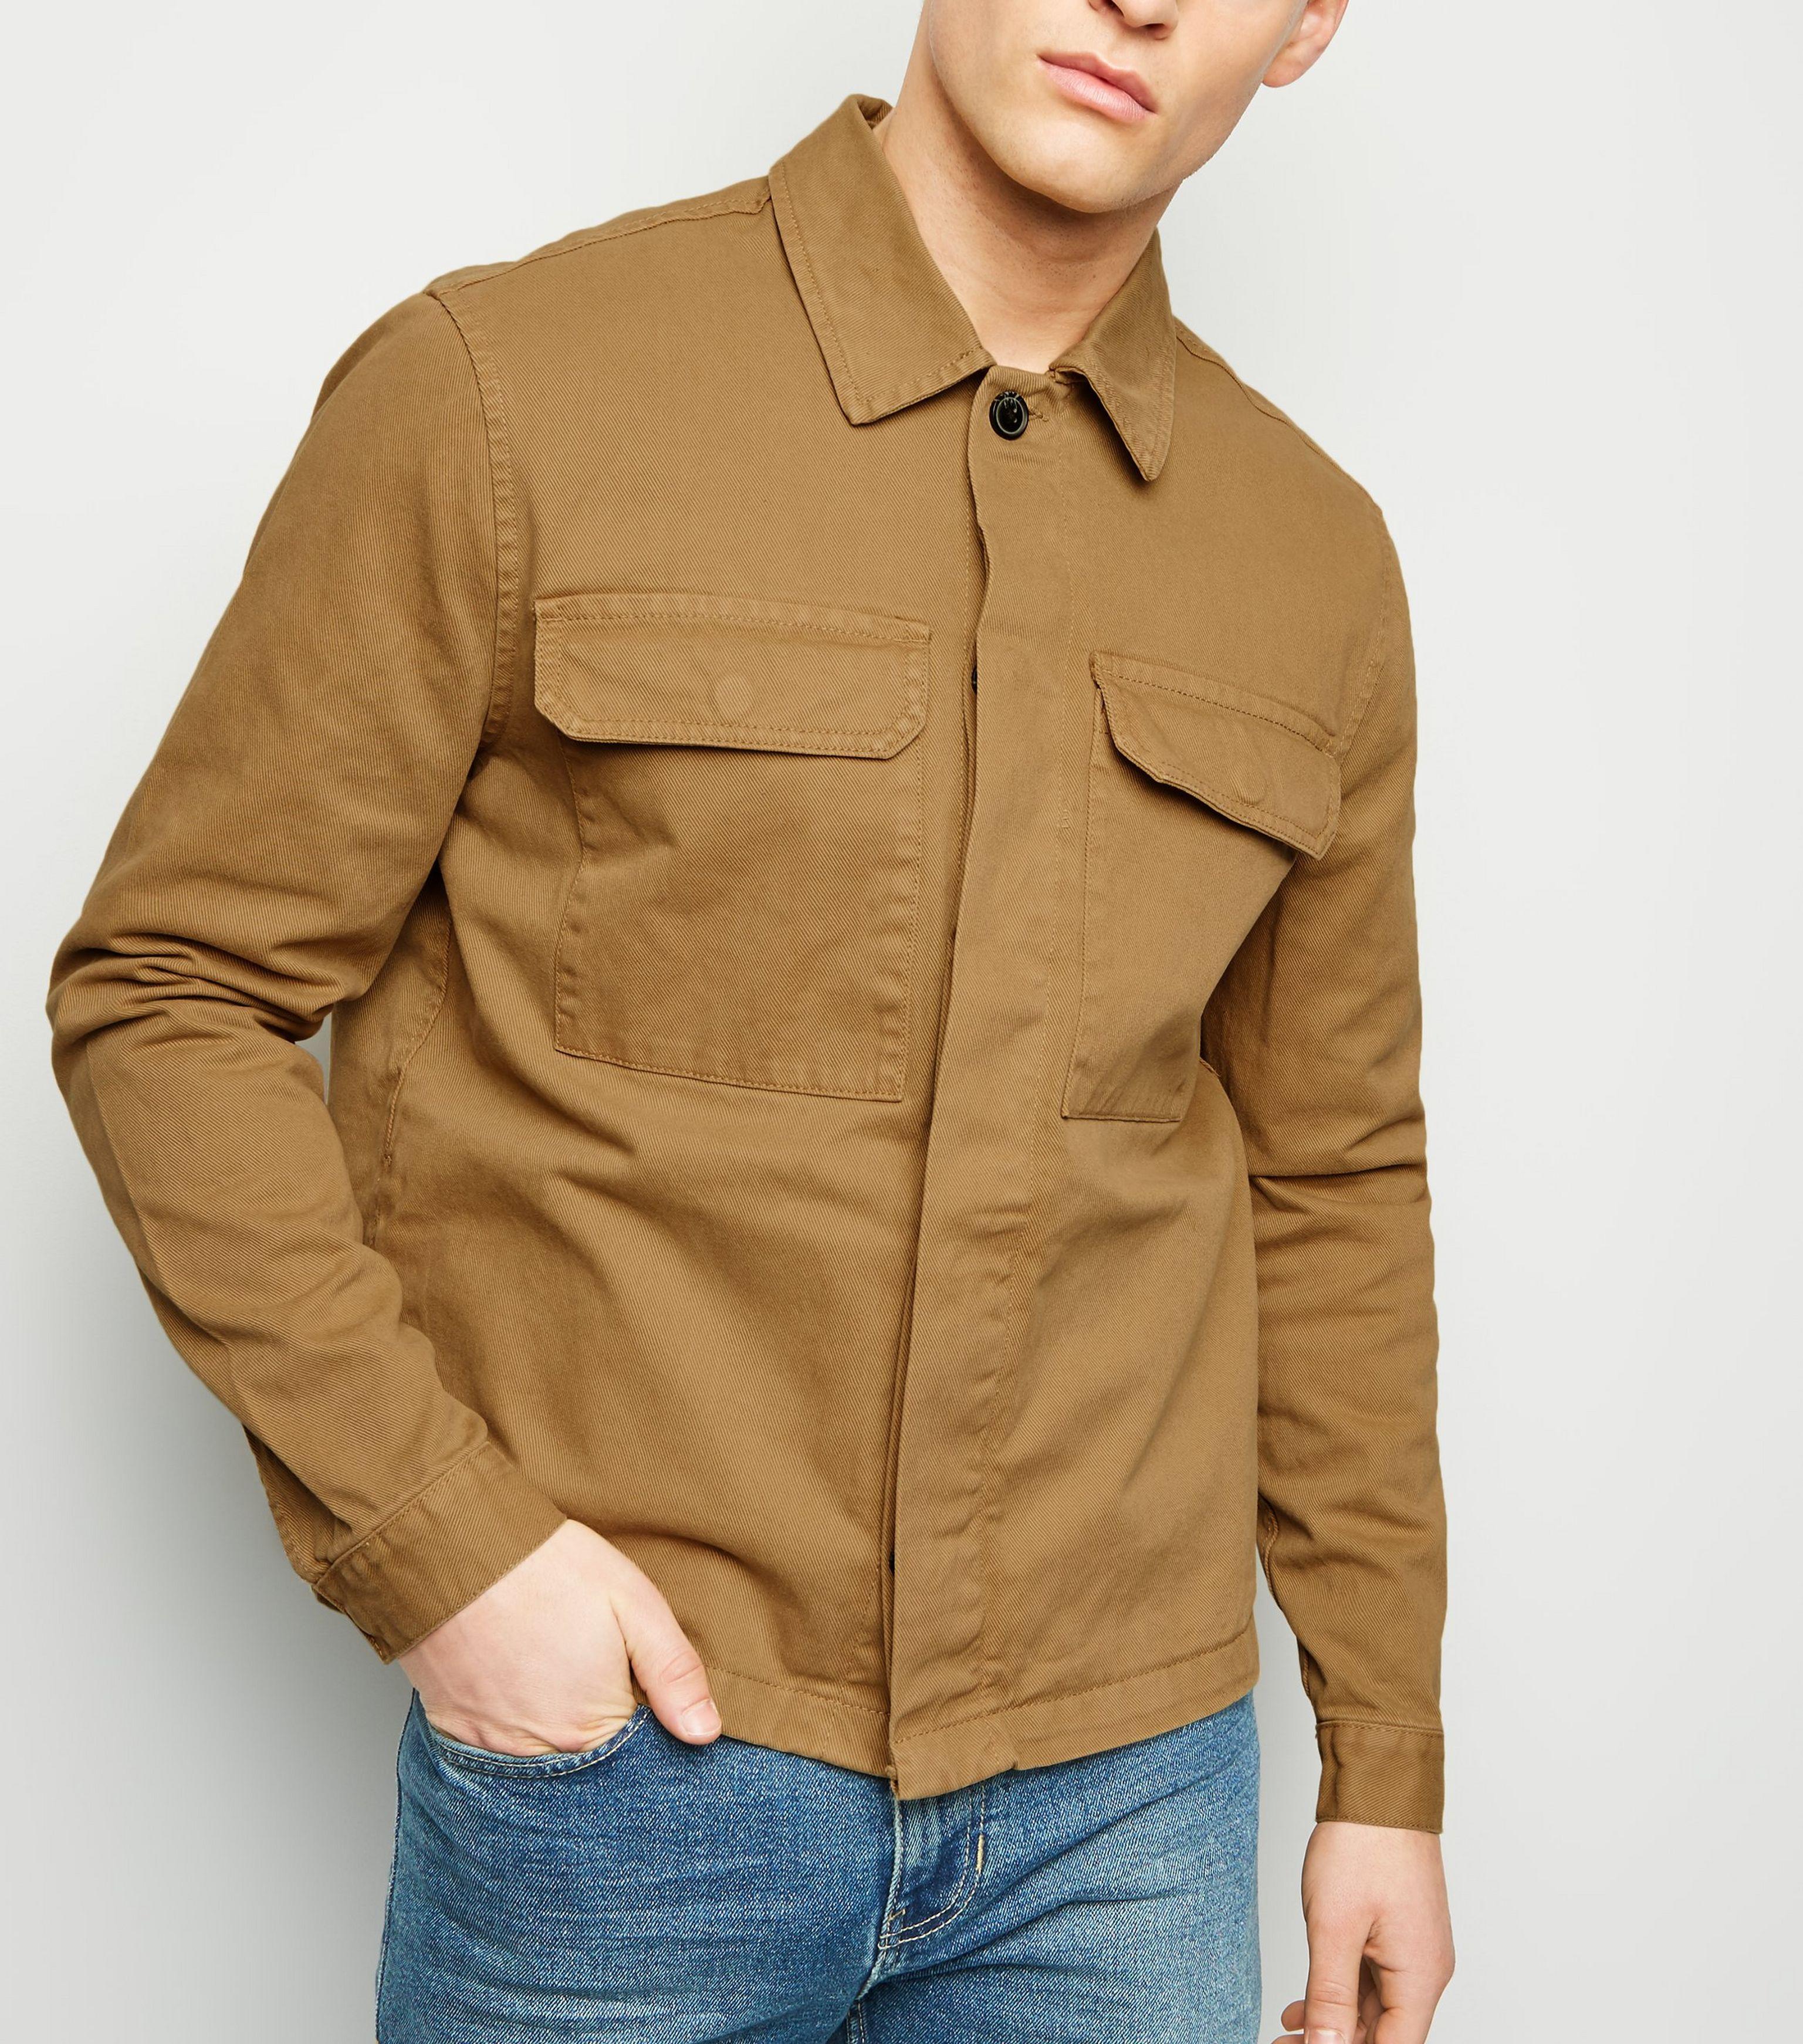 New Look Burgundy Utility Denim Jacket Fashion Clothes, Shoes ...